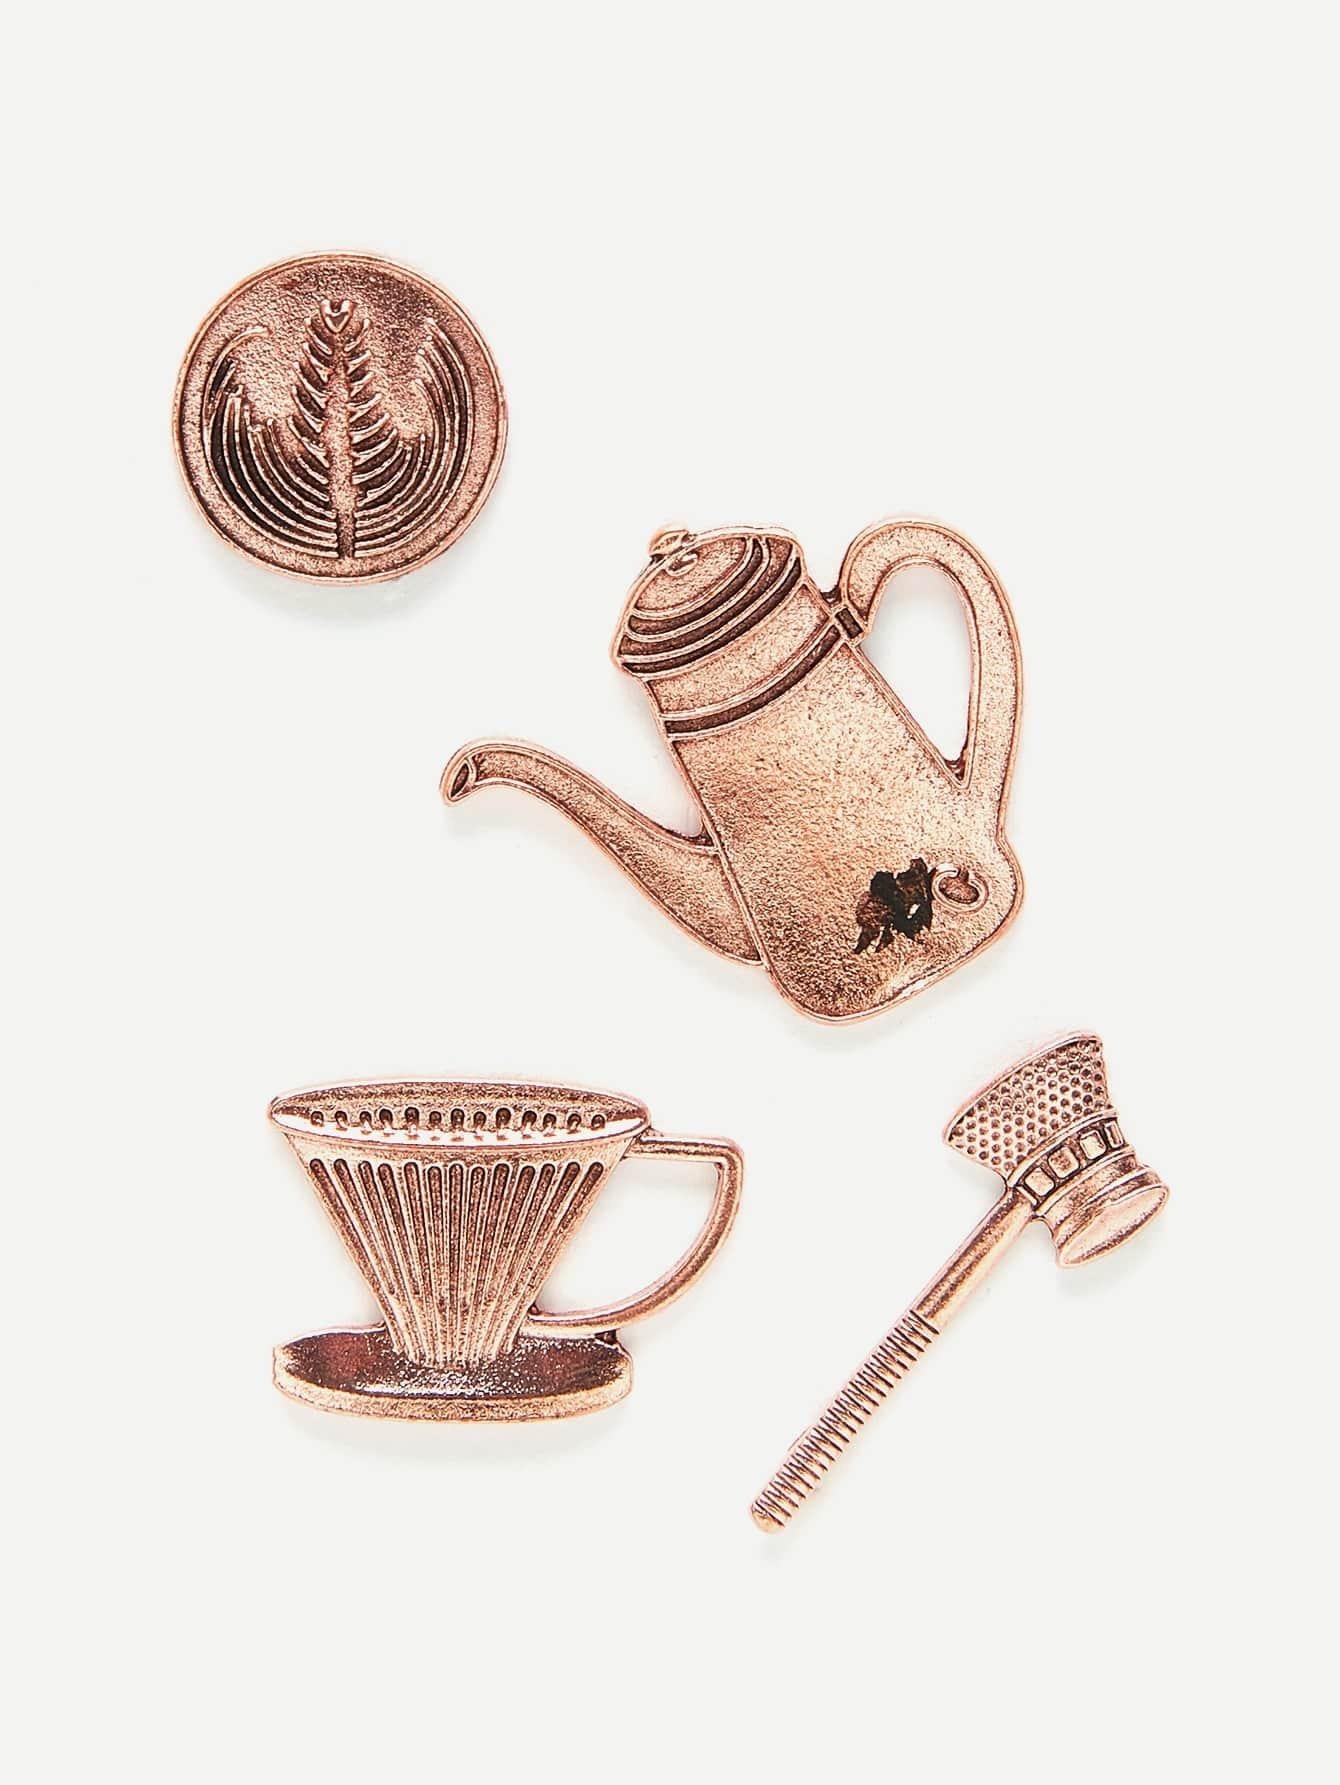 Teapot & Cup Design Brooch Set brooch180313314